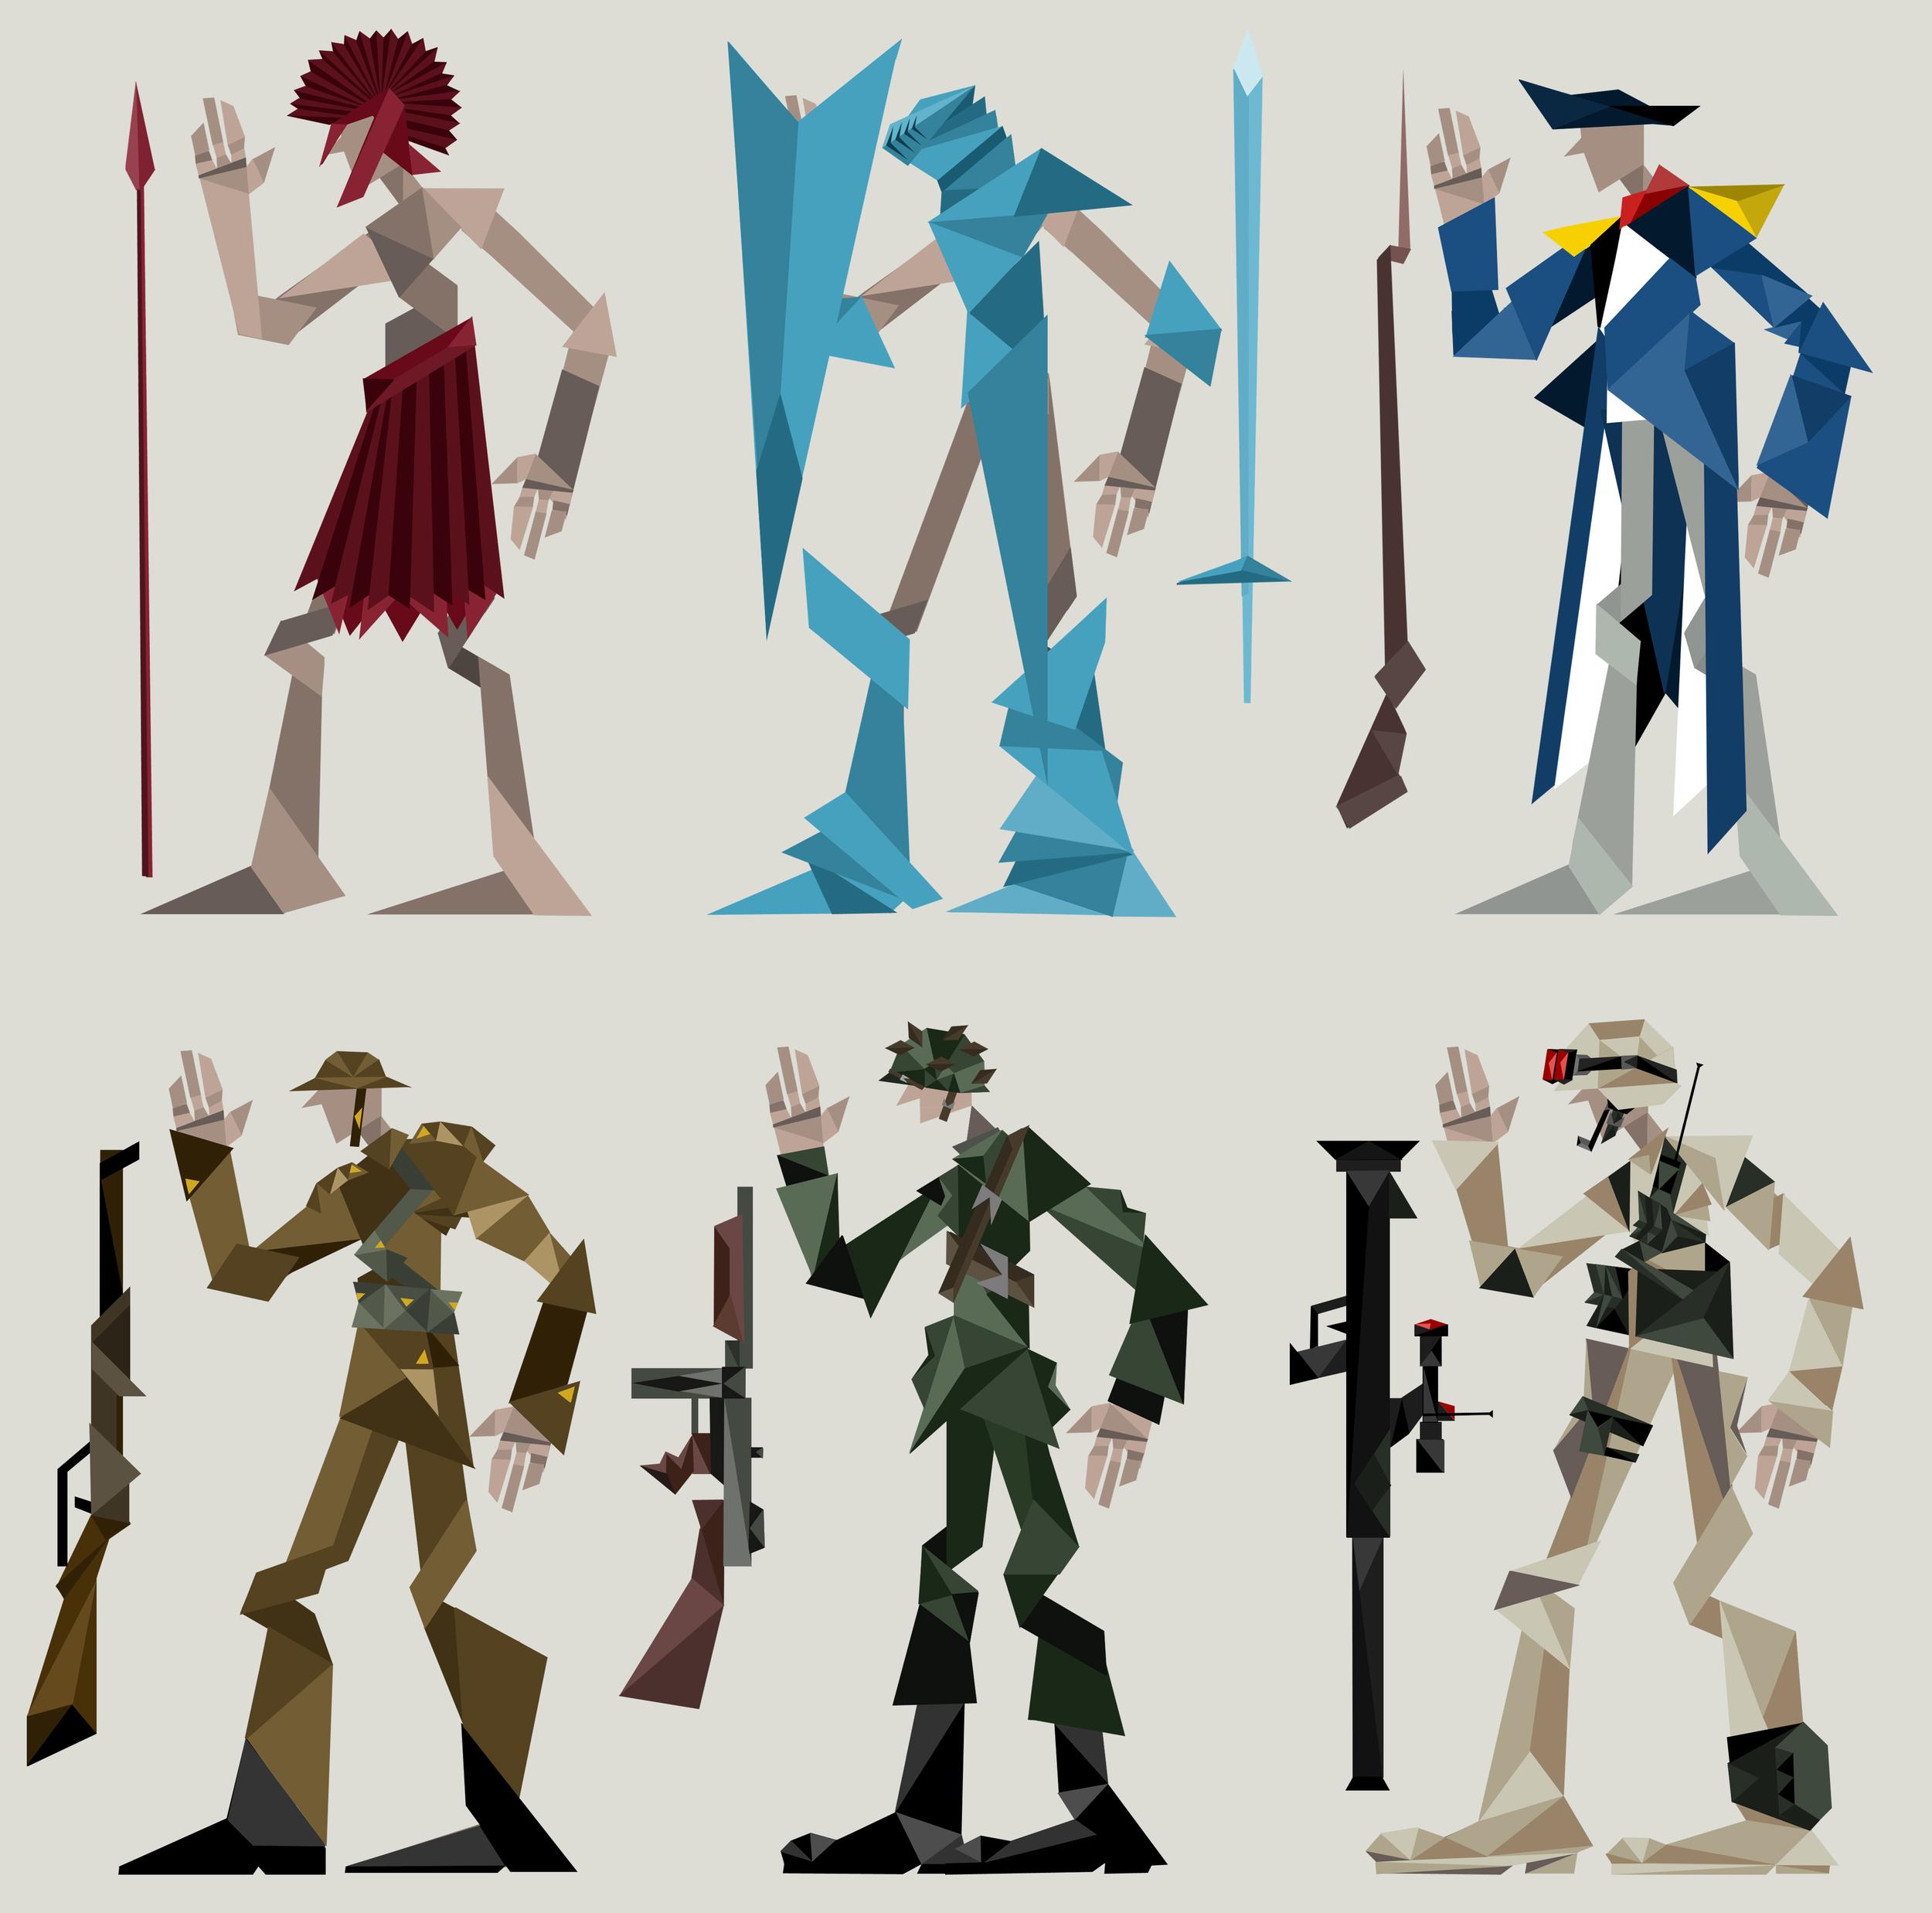 character_design_warriors.jpg